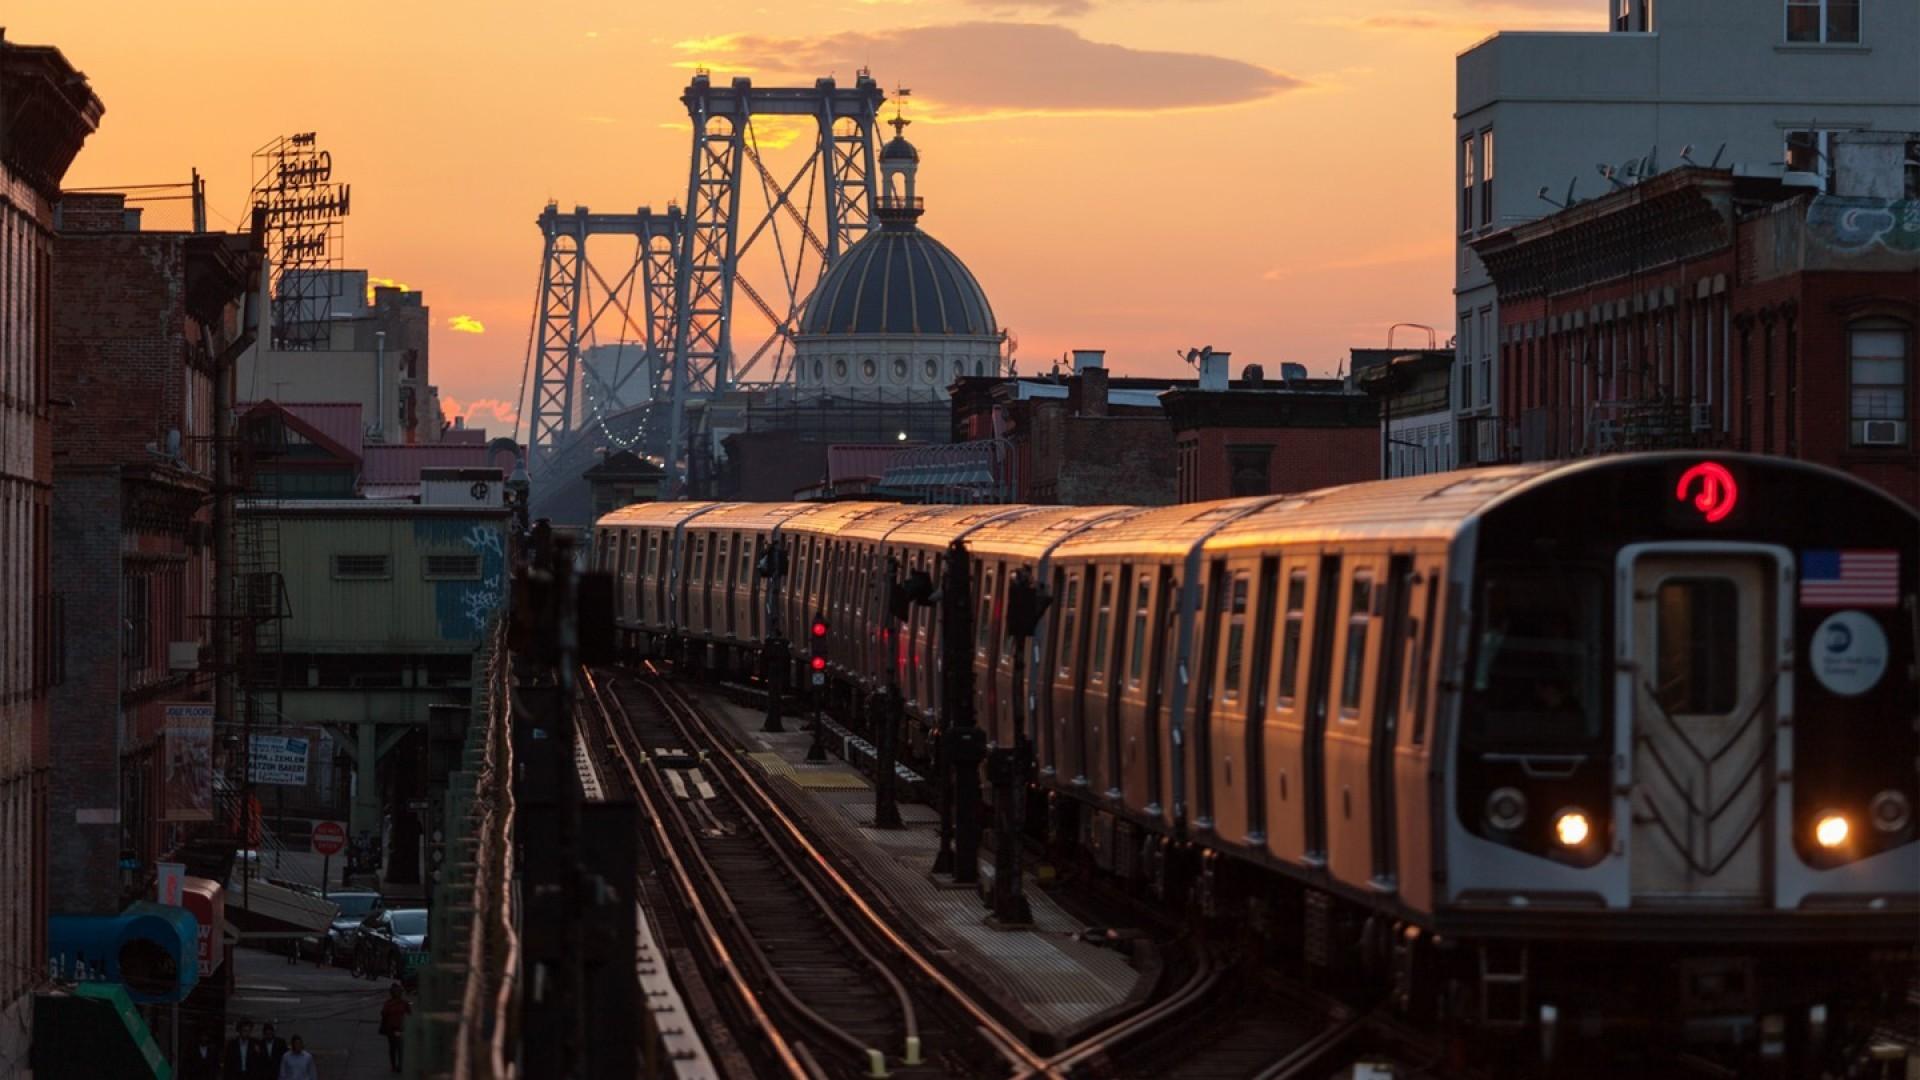 bridges-subway-coming-williamsburgh-bridge-nyc-sunset-cityscapes-new-york-city-brooklyn-sundown-dome-tracks-background-images.jpg